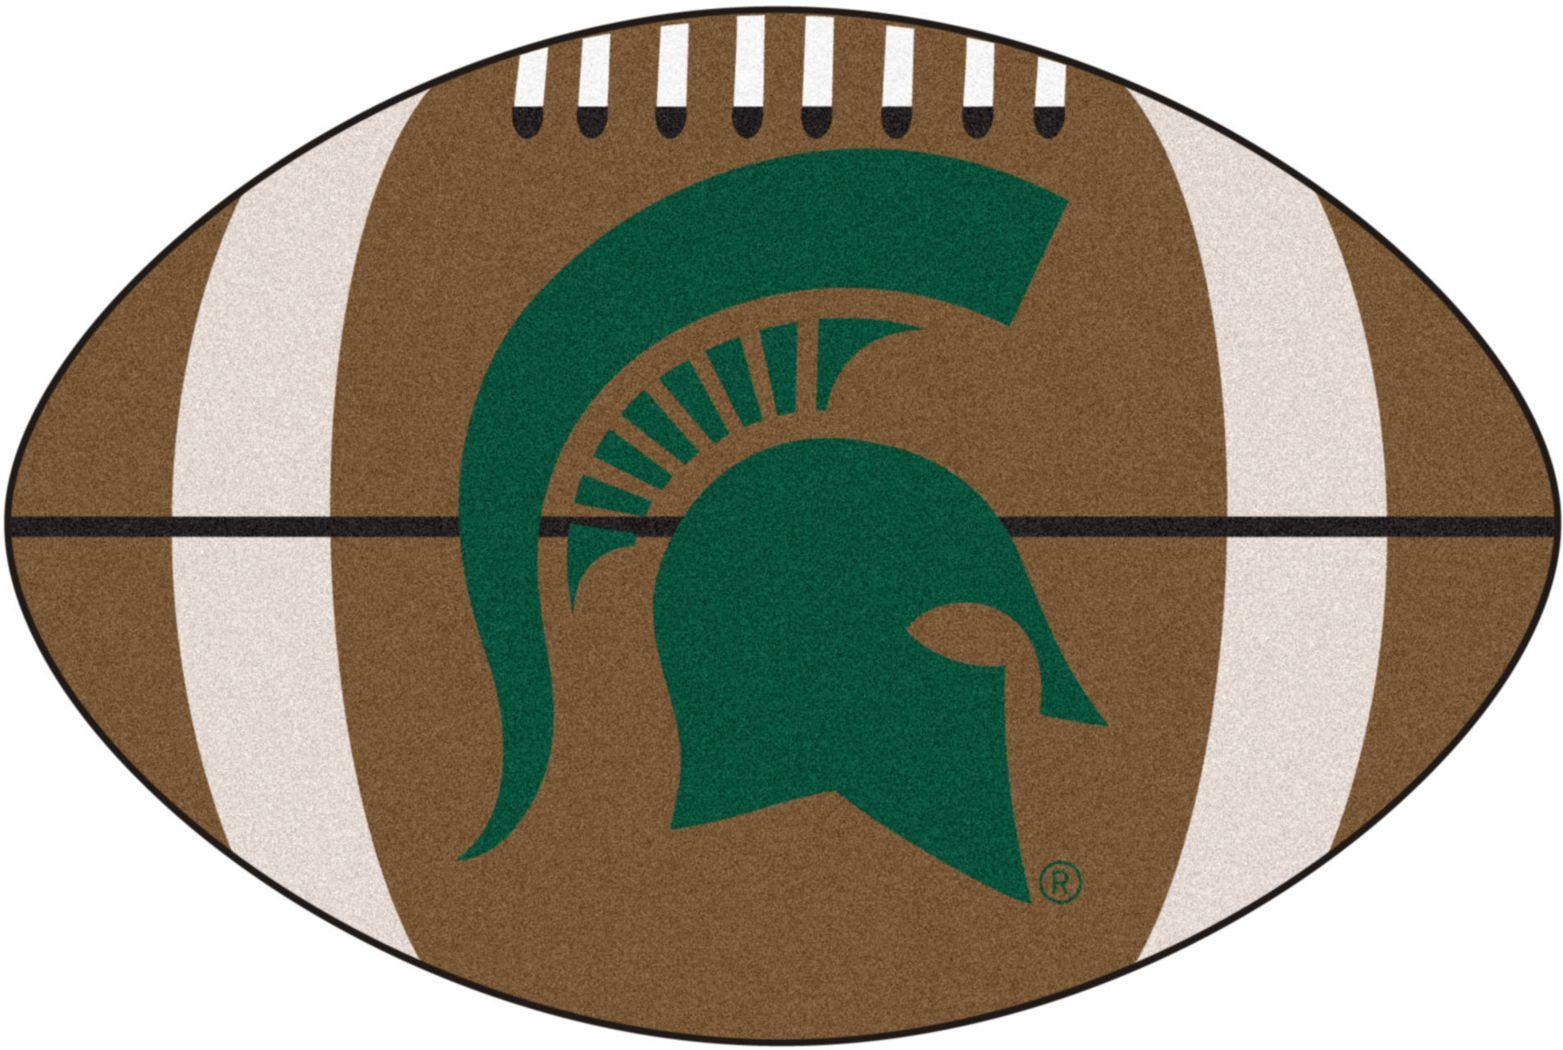 "NCAA Football Mascot Michigan State University 1'6"" x 1'10"" Rug"